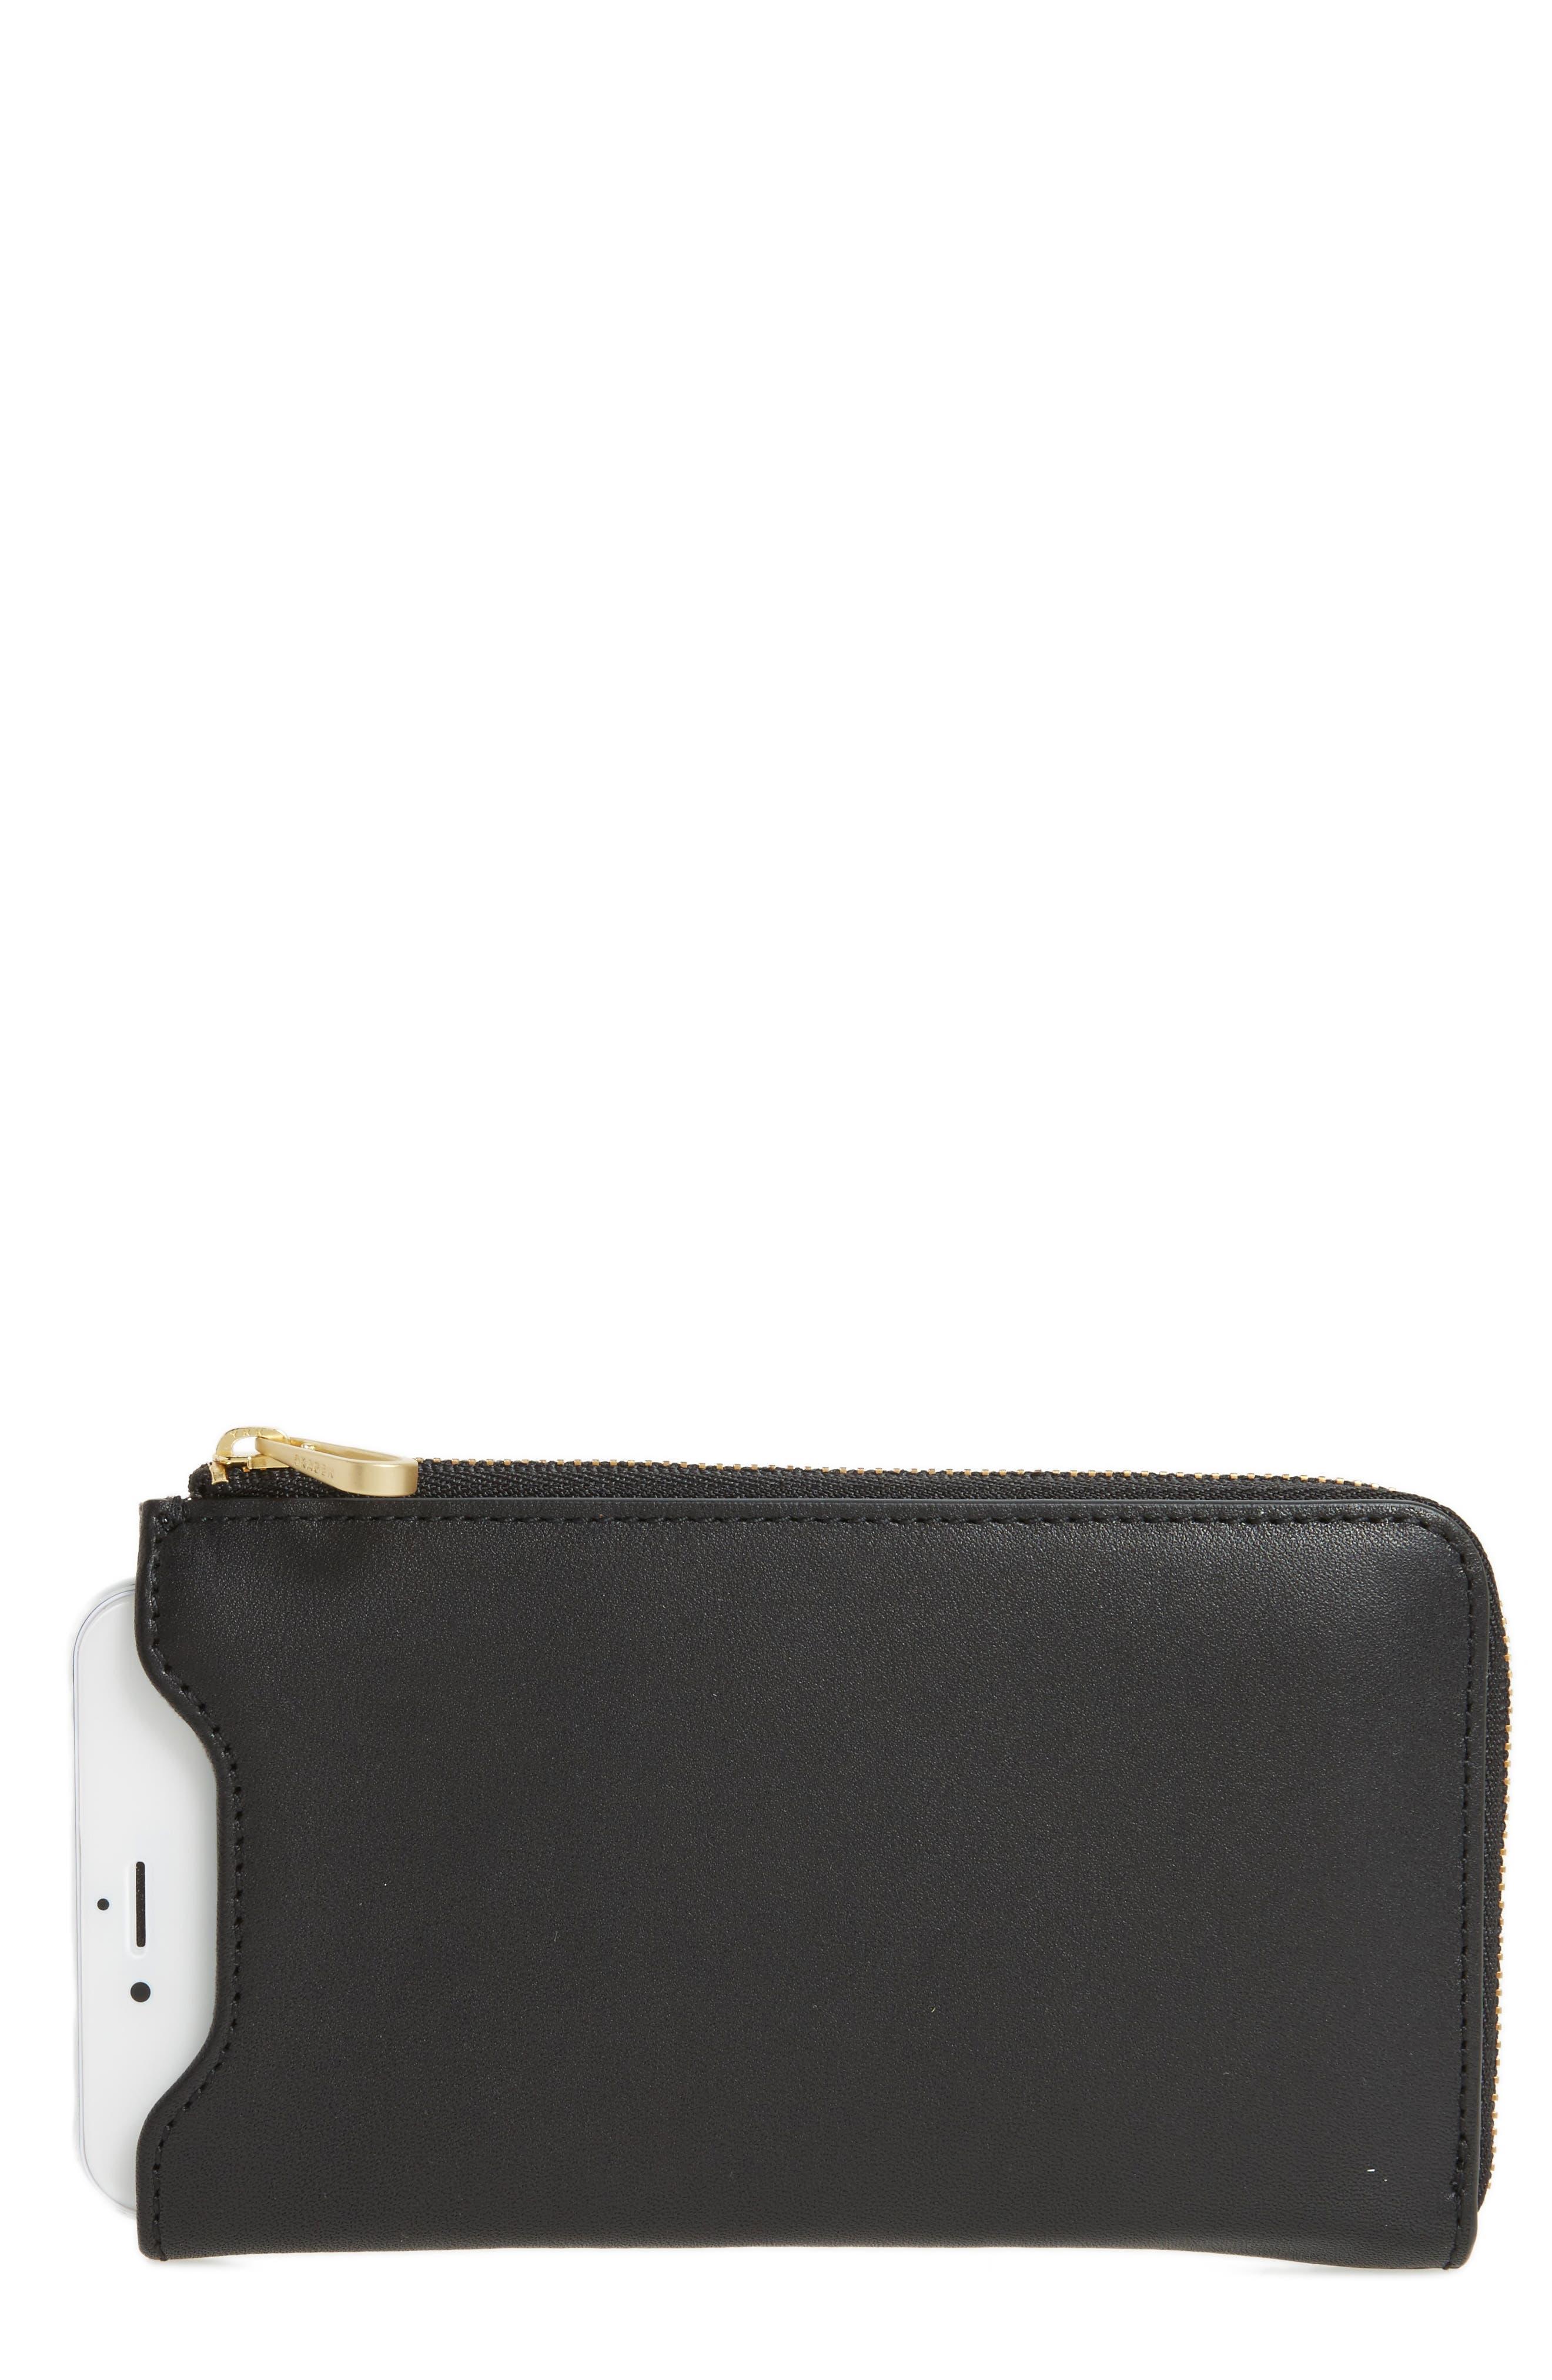 Main Image - Skagen Lilli iPhone 6/6s/7 Leather Sleeve